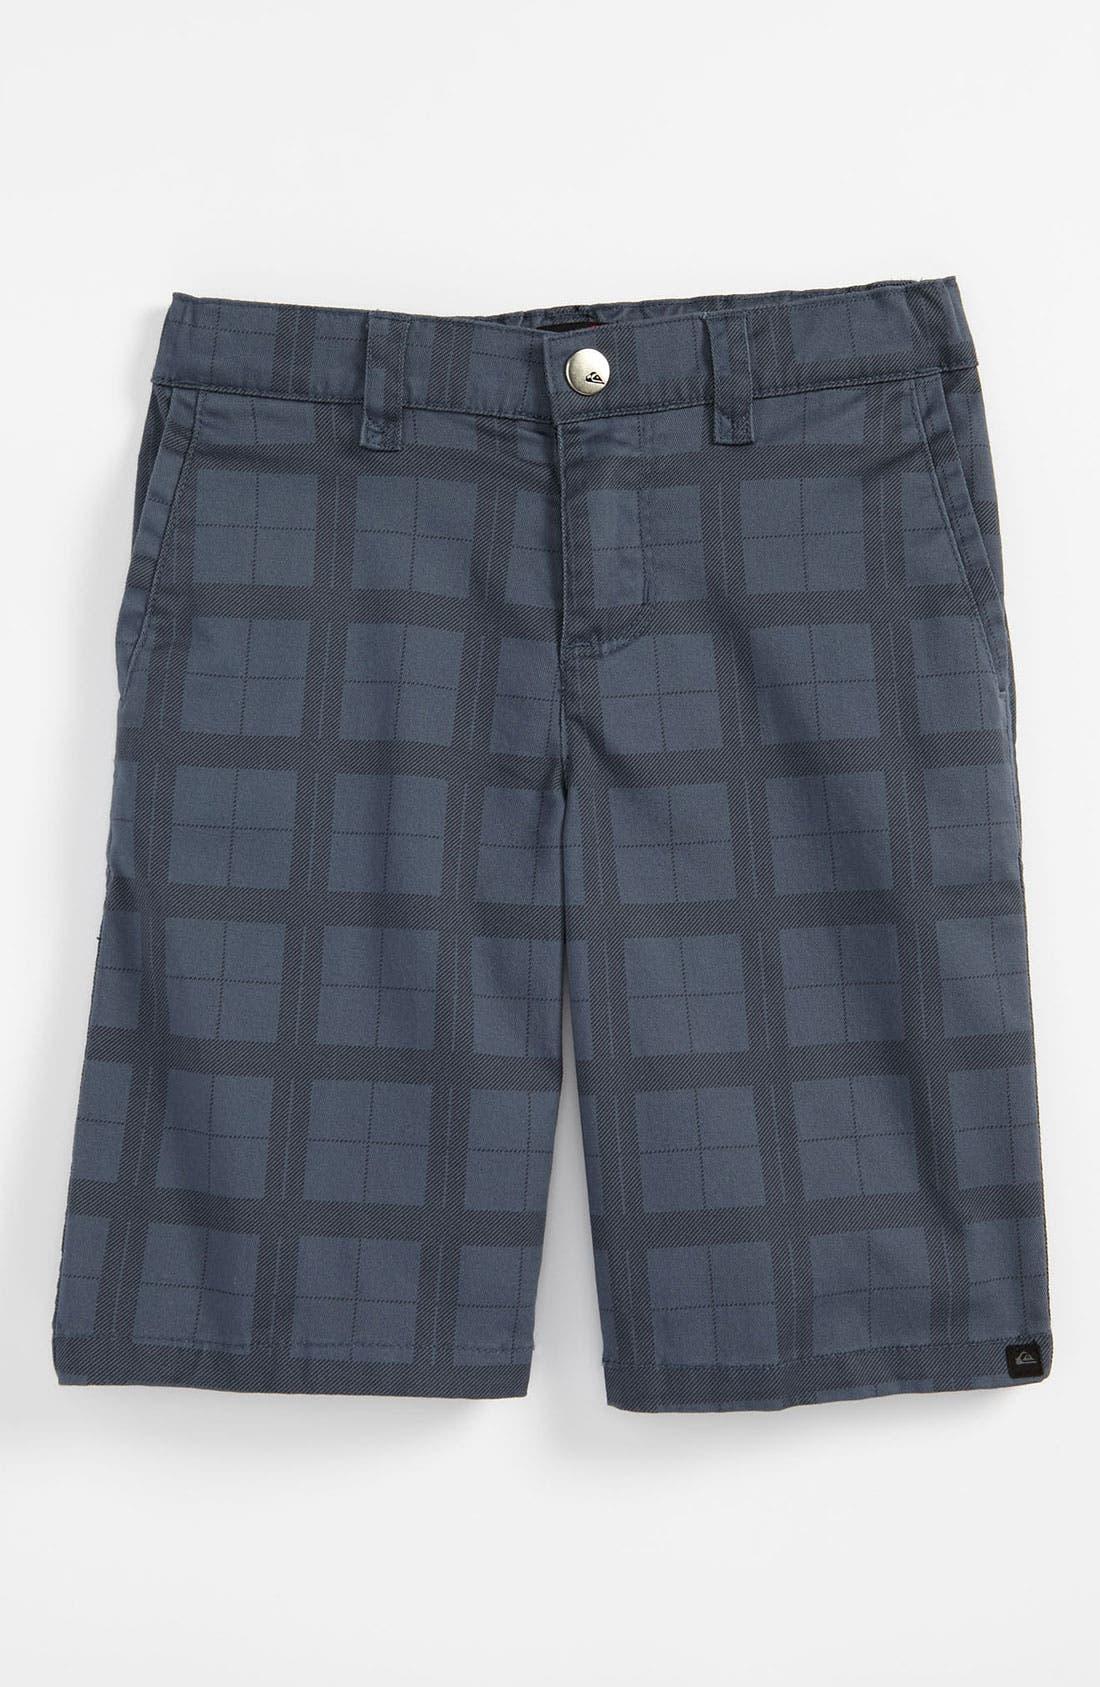 Alternate Image 1 Selected - Quiksilver 'Uno Surplus' Shorts (Little Boys)